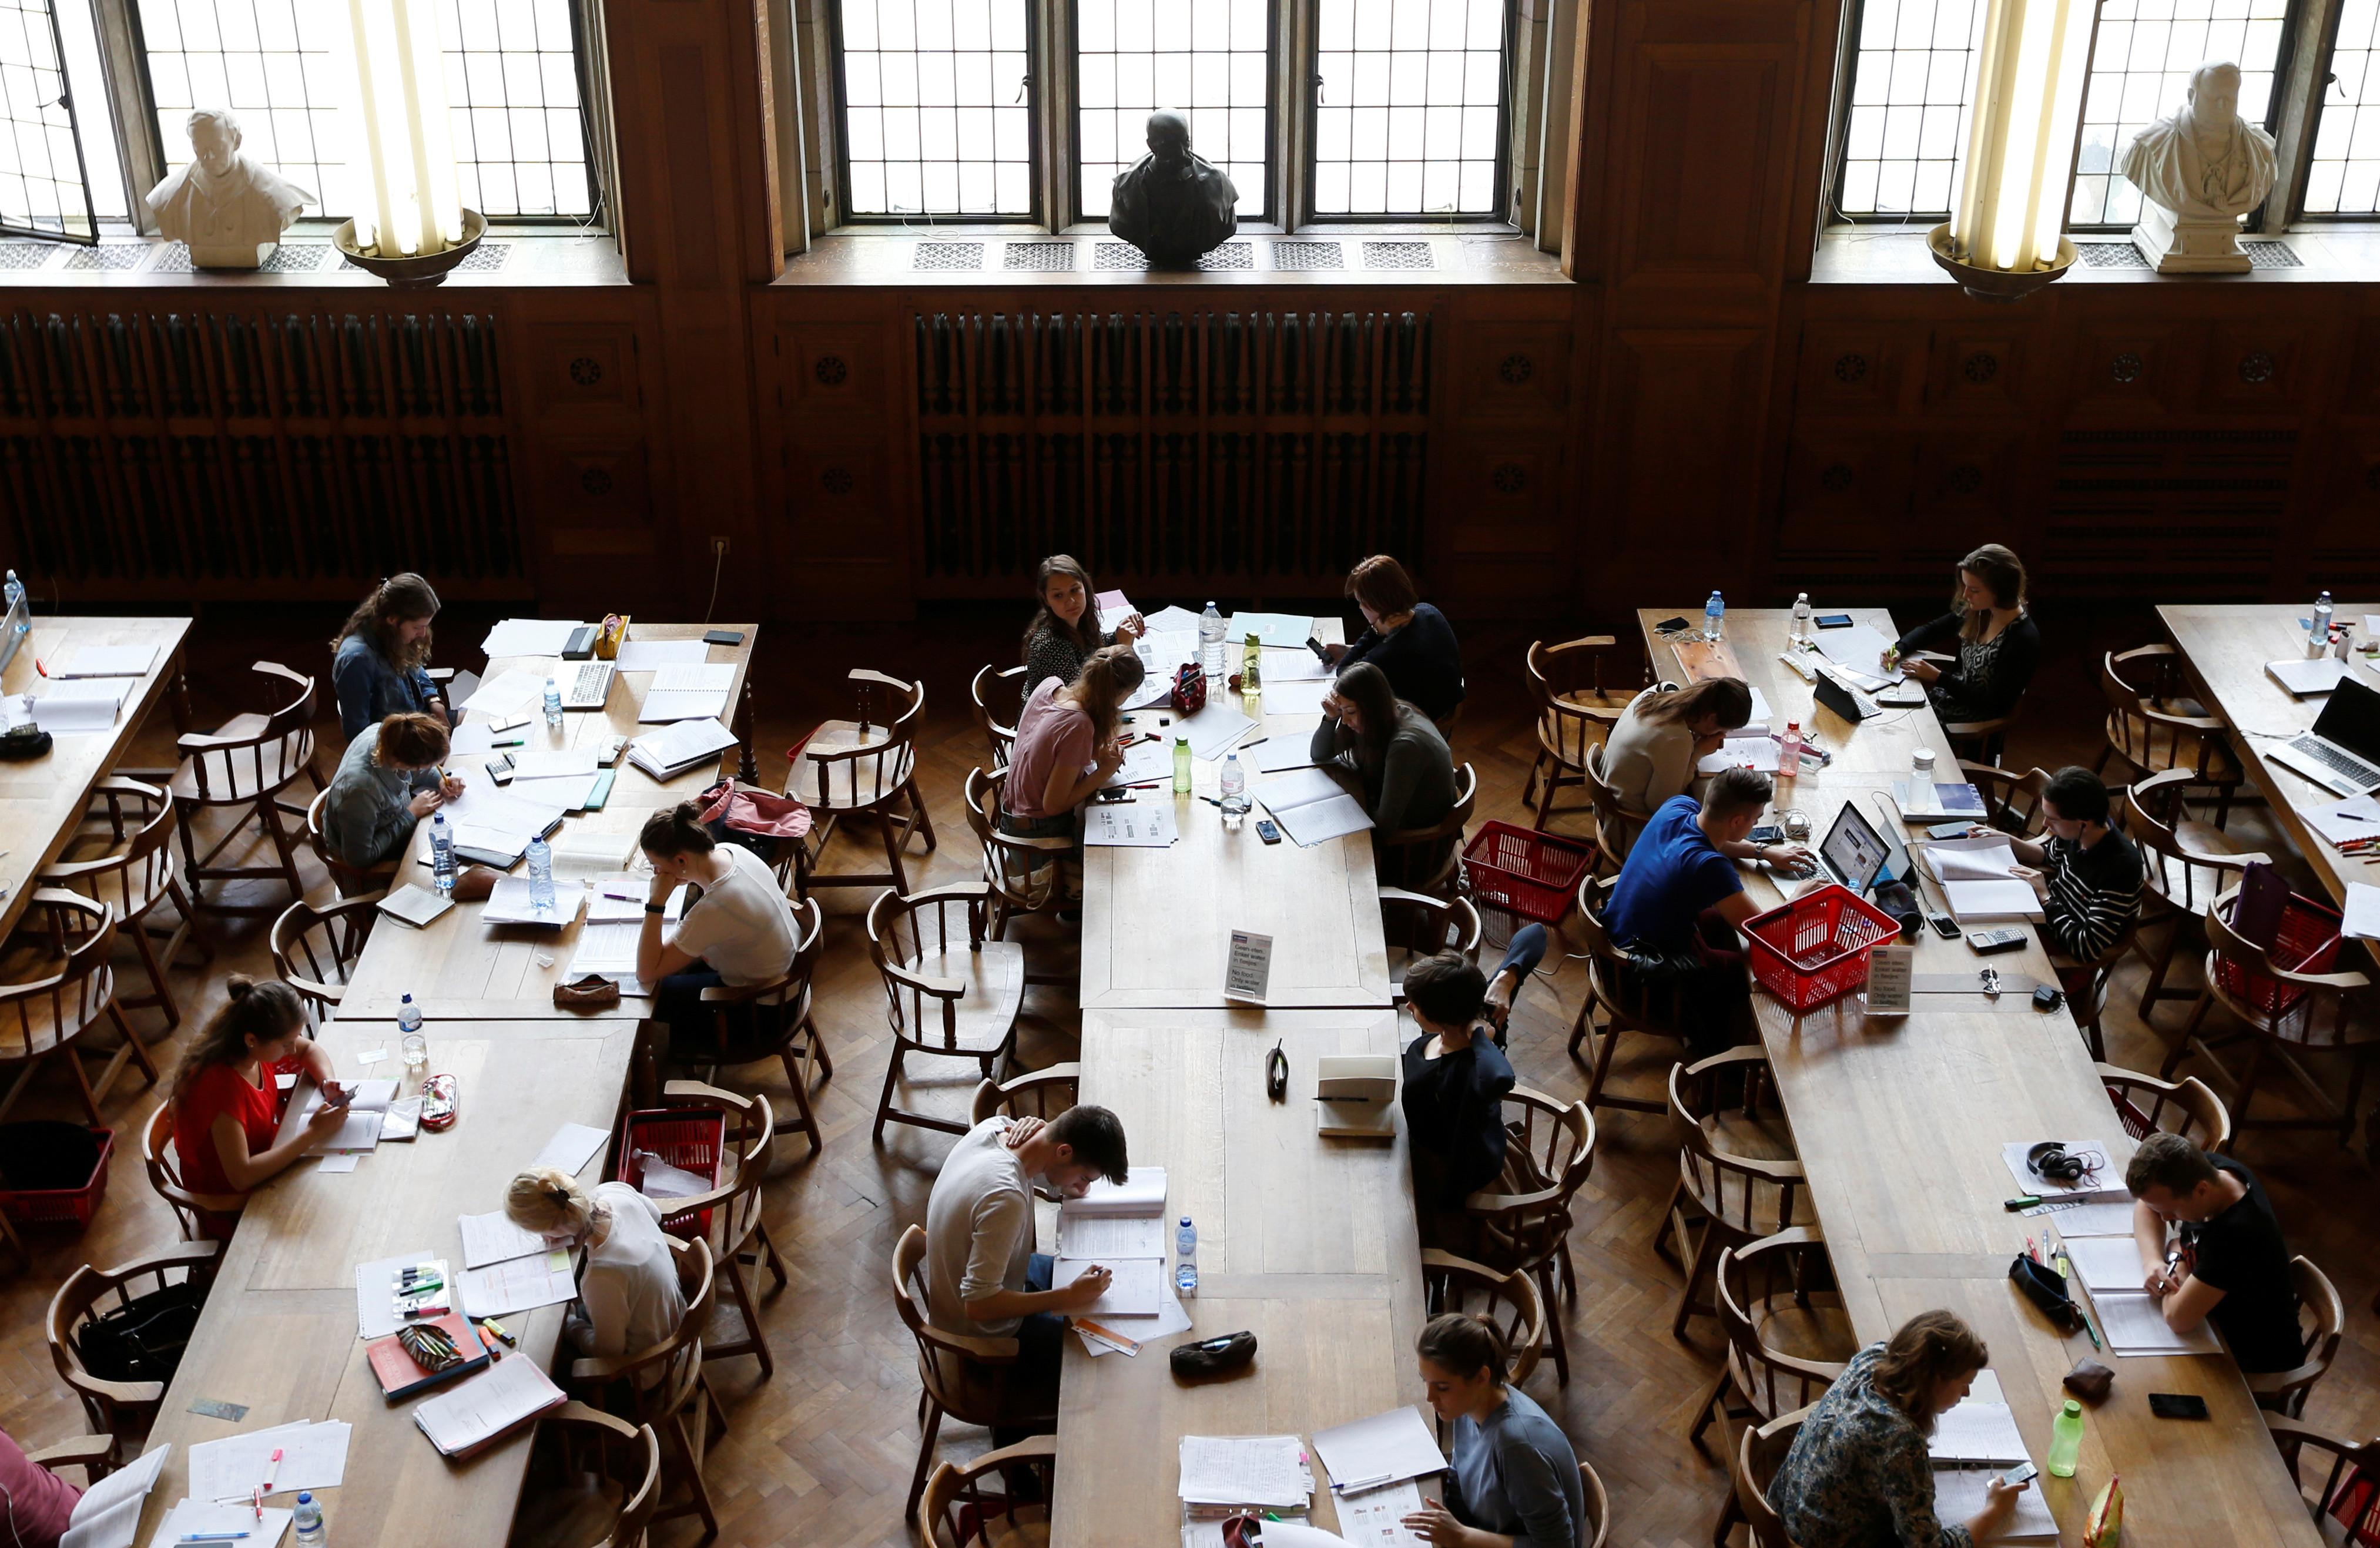 "Students sit in the library of the university KU Leuven ""Katholieke Universiteit Leuven"" in Leuven, Belgium, June 8, 2016. REUTERS/Francois Lenoir - D1AETIXBEXAA"